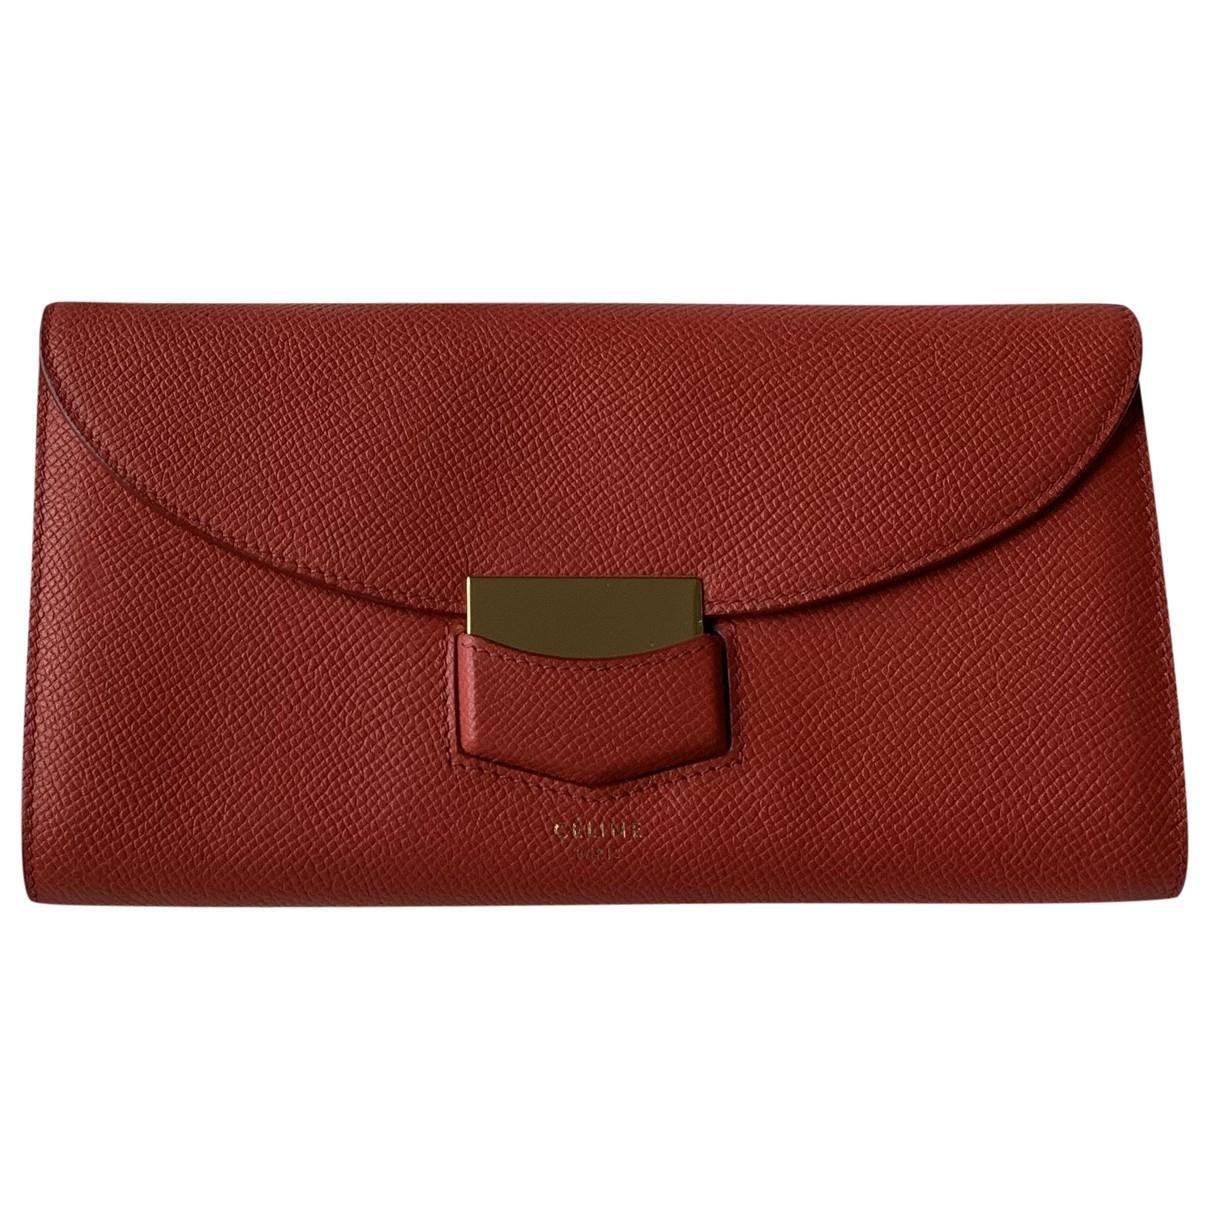 Celine \N Red Leather wallet for Women \N